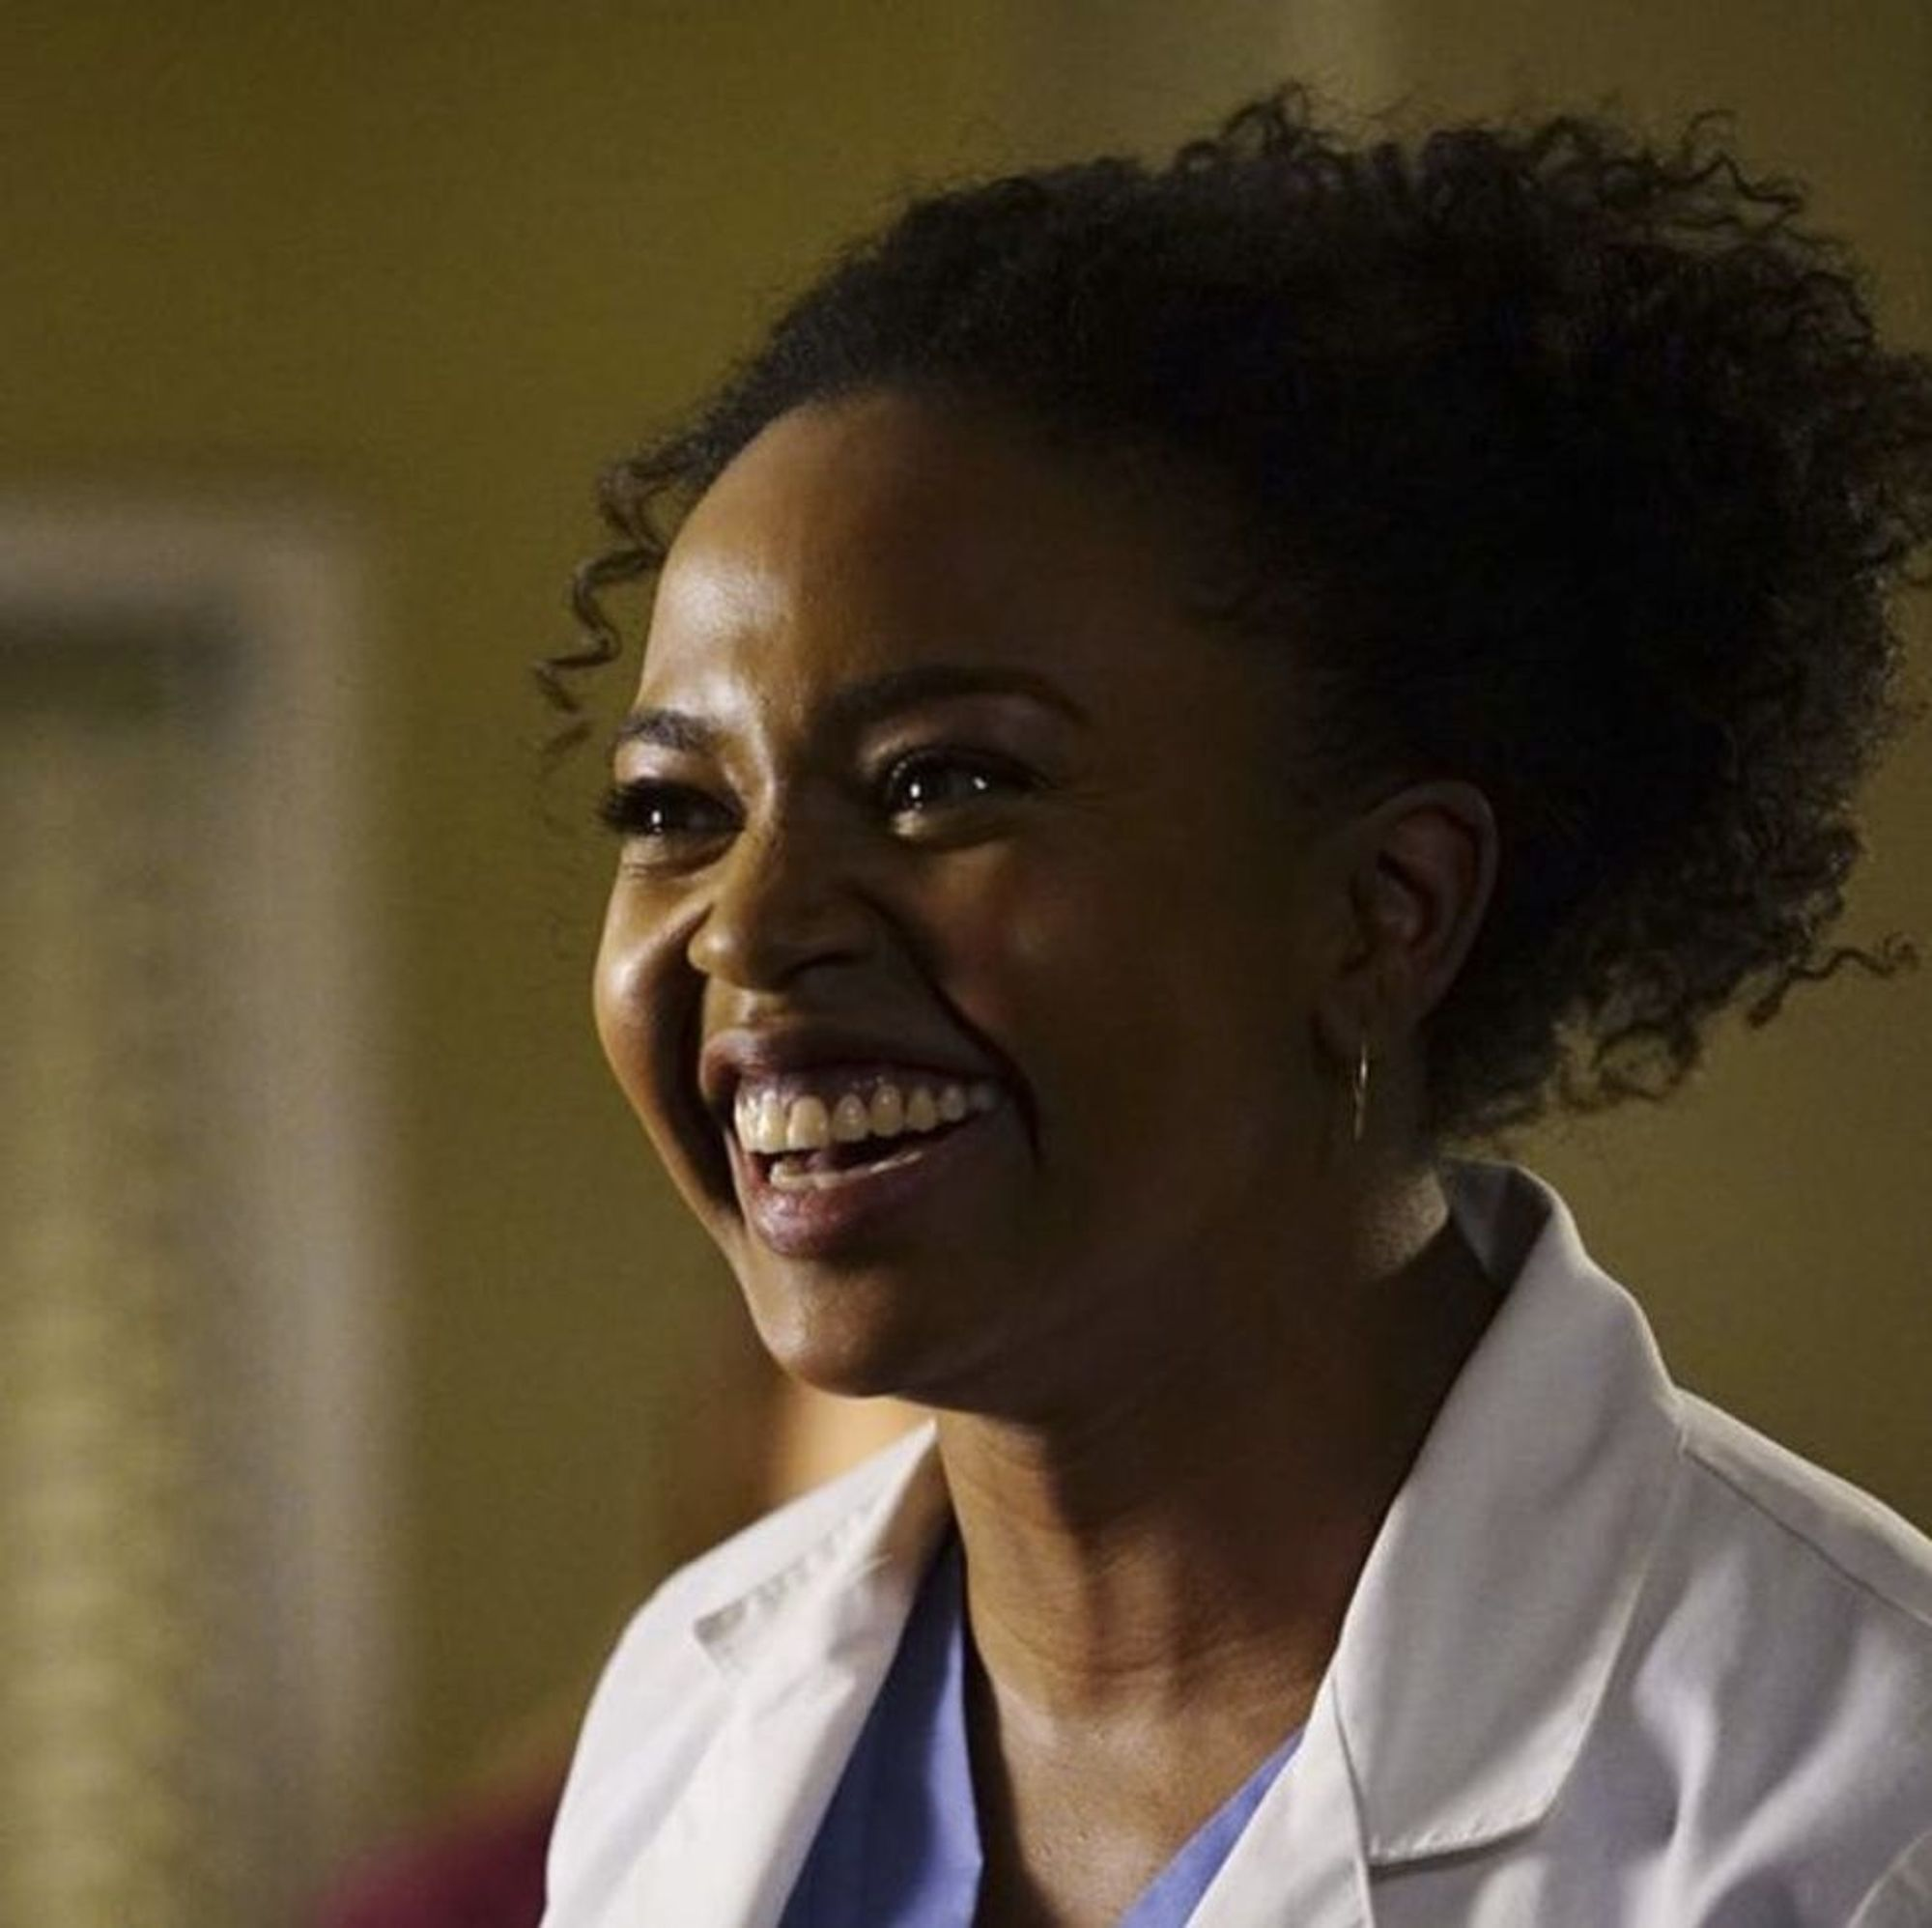 Grey S Anatomy Season 13 Episode 23 Ring Of Fire Brit Co